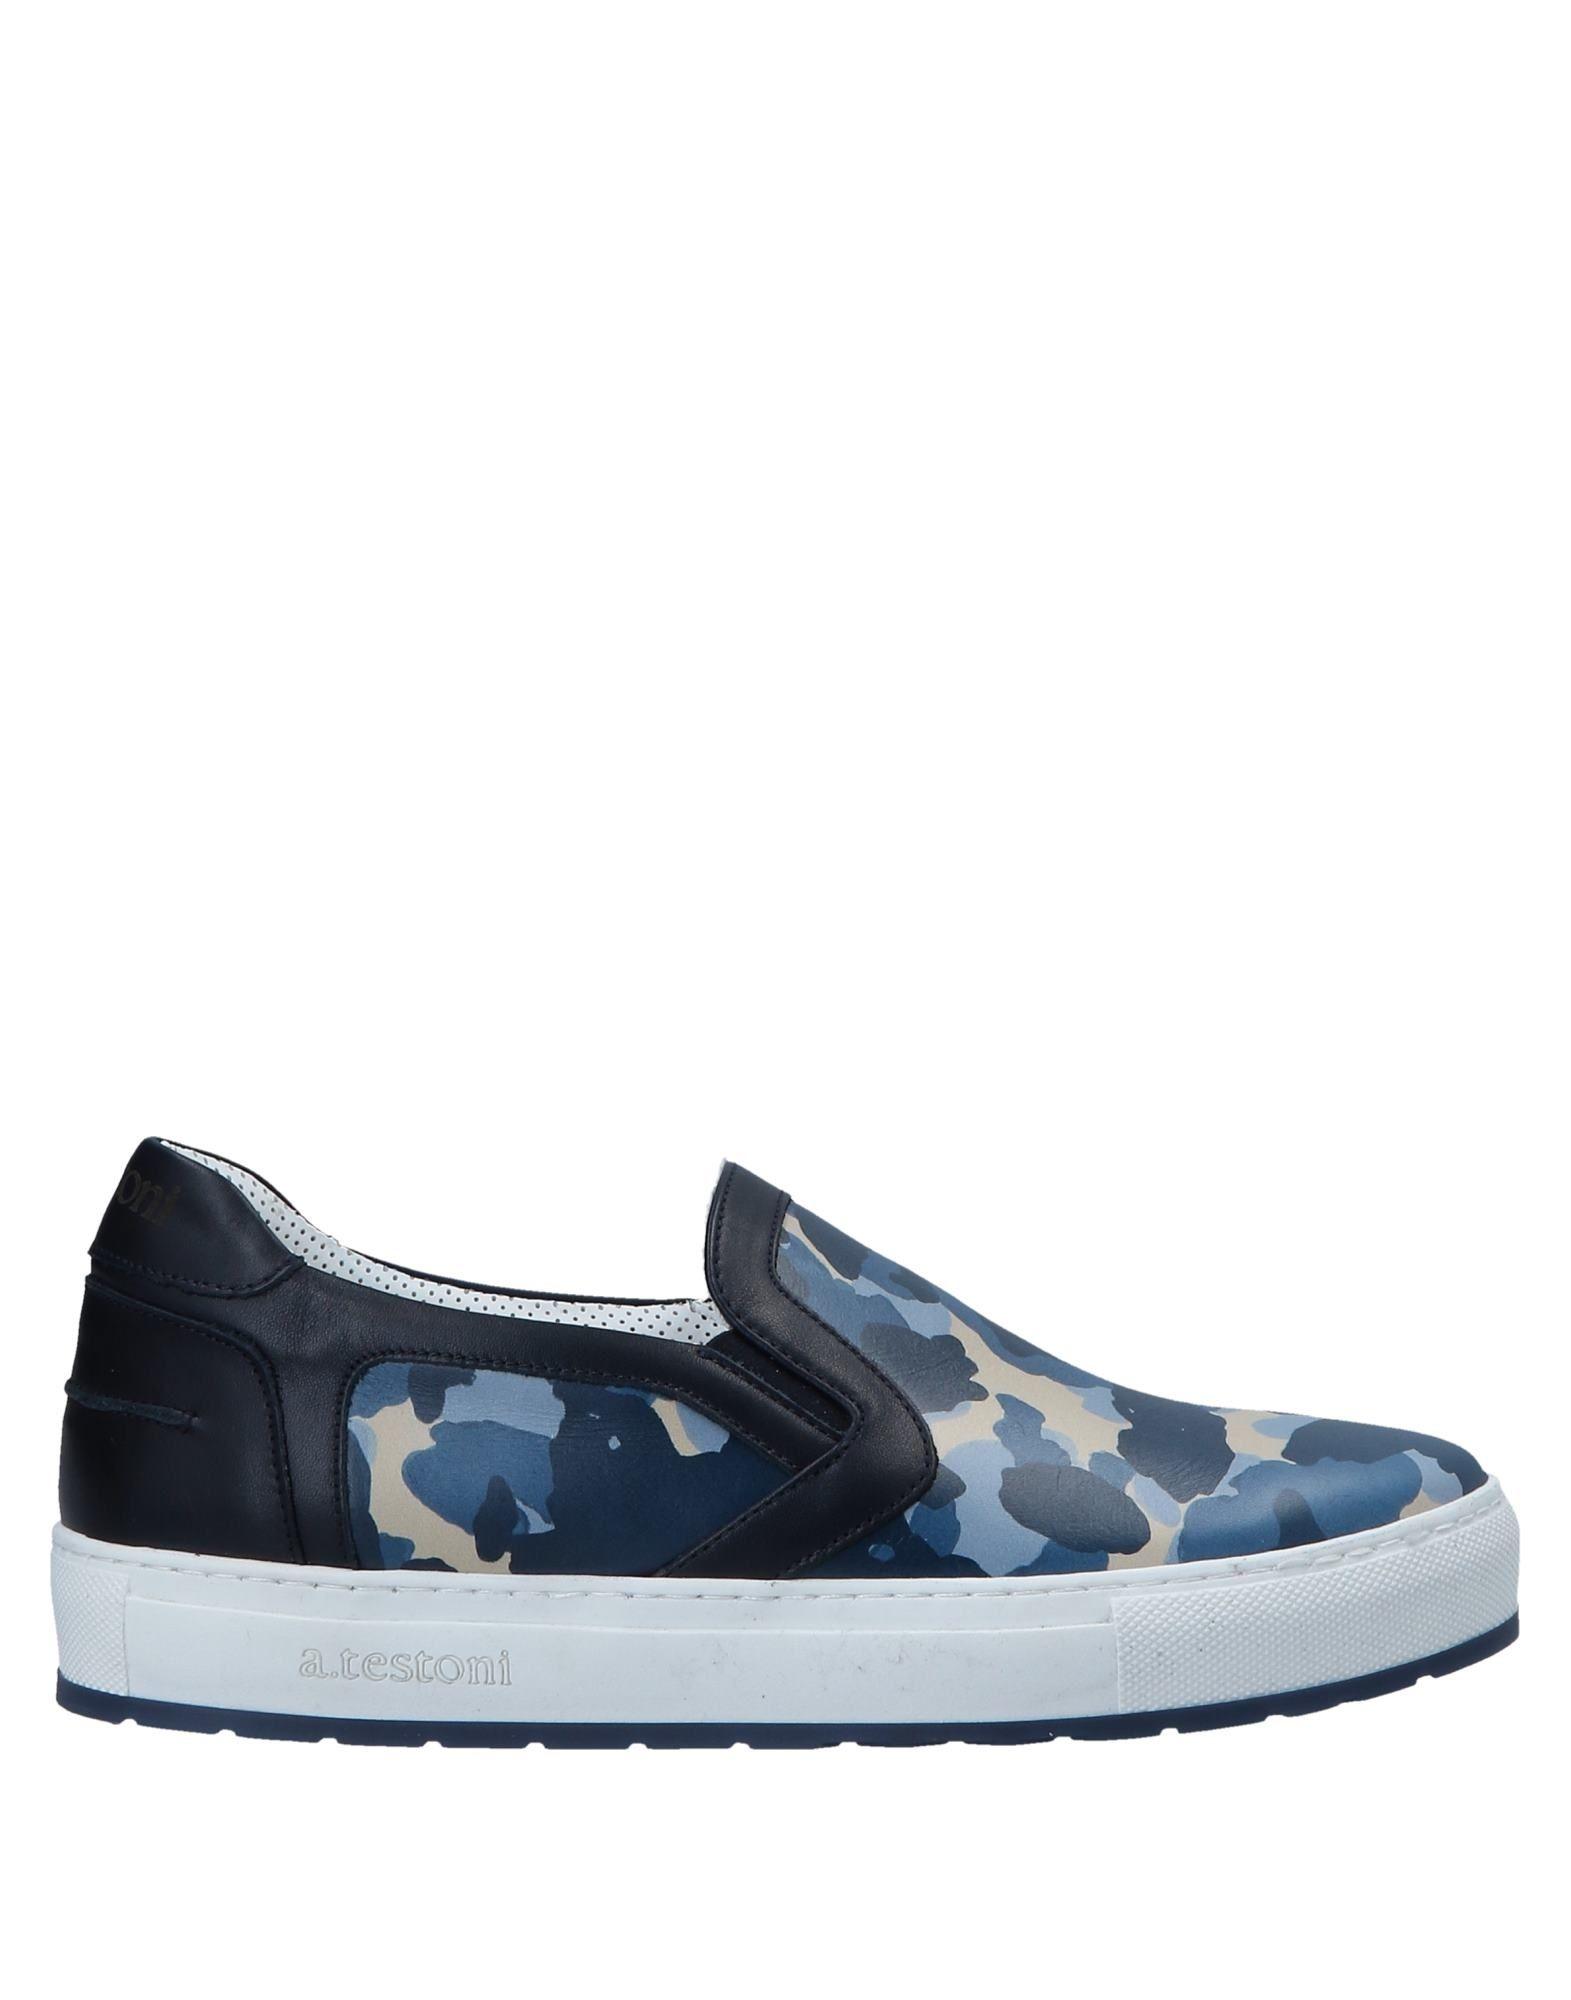 A.Testoni Sneakers Herren  11555458TA Gute Qualität beliebte Schuhe